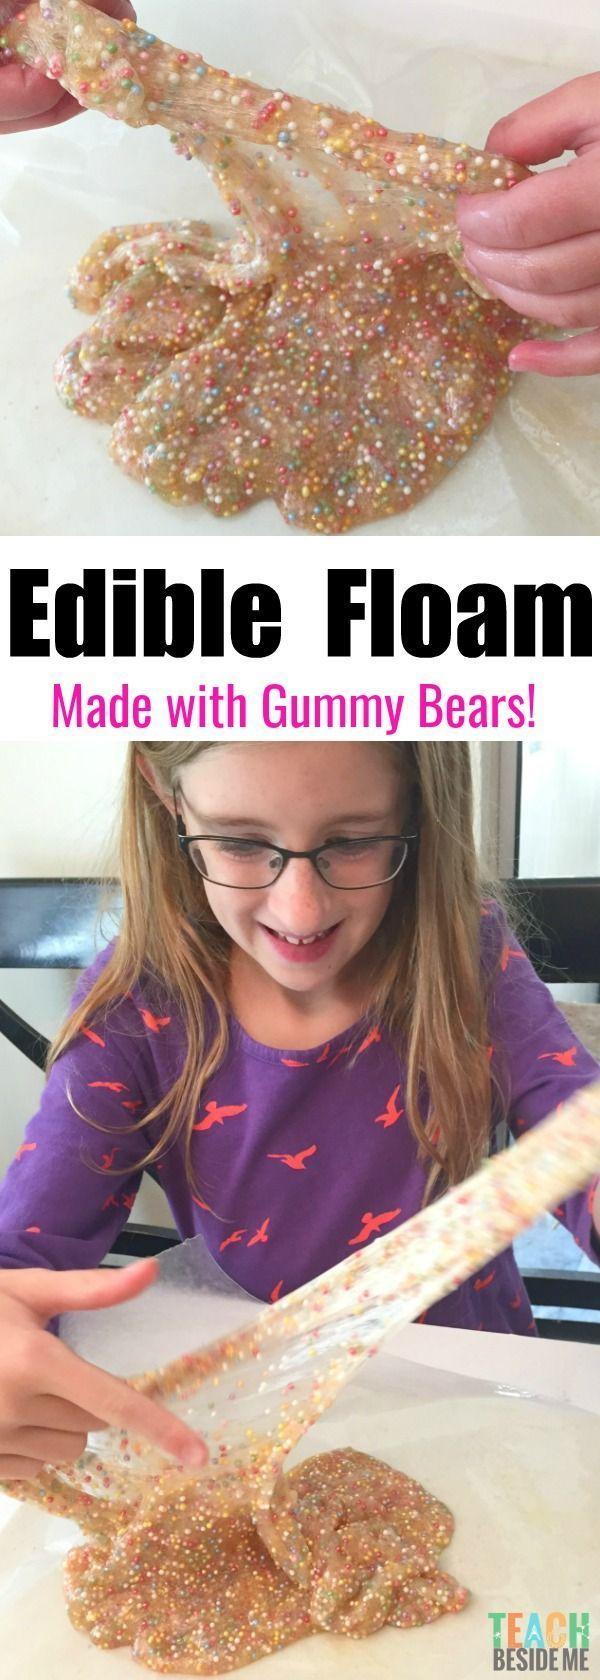 Edible Floam From Gummy Bears